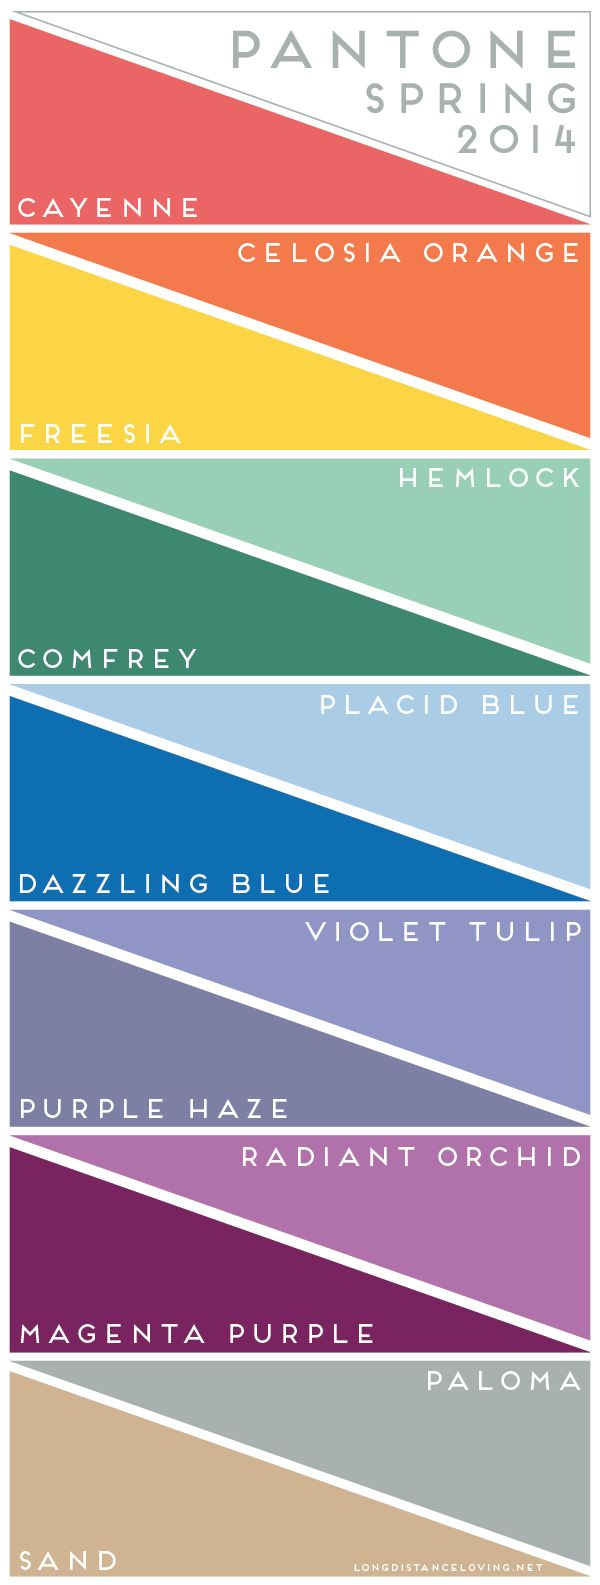 Pantone Spring 2014 colour release